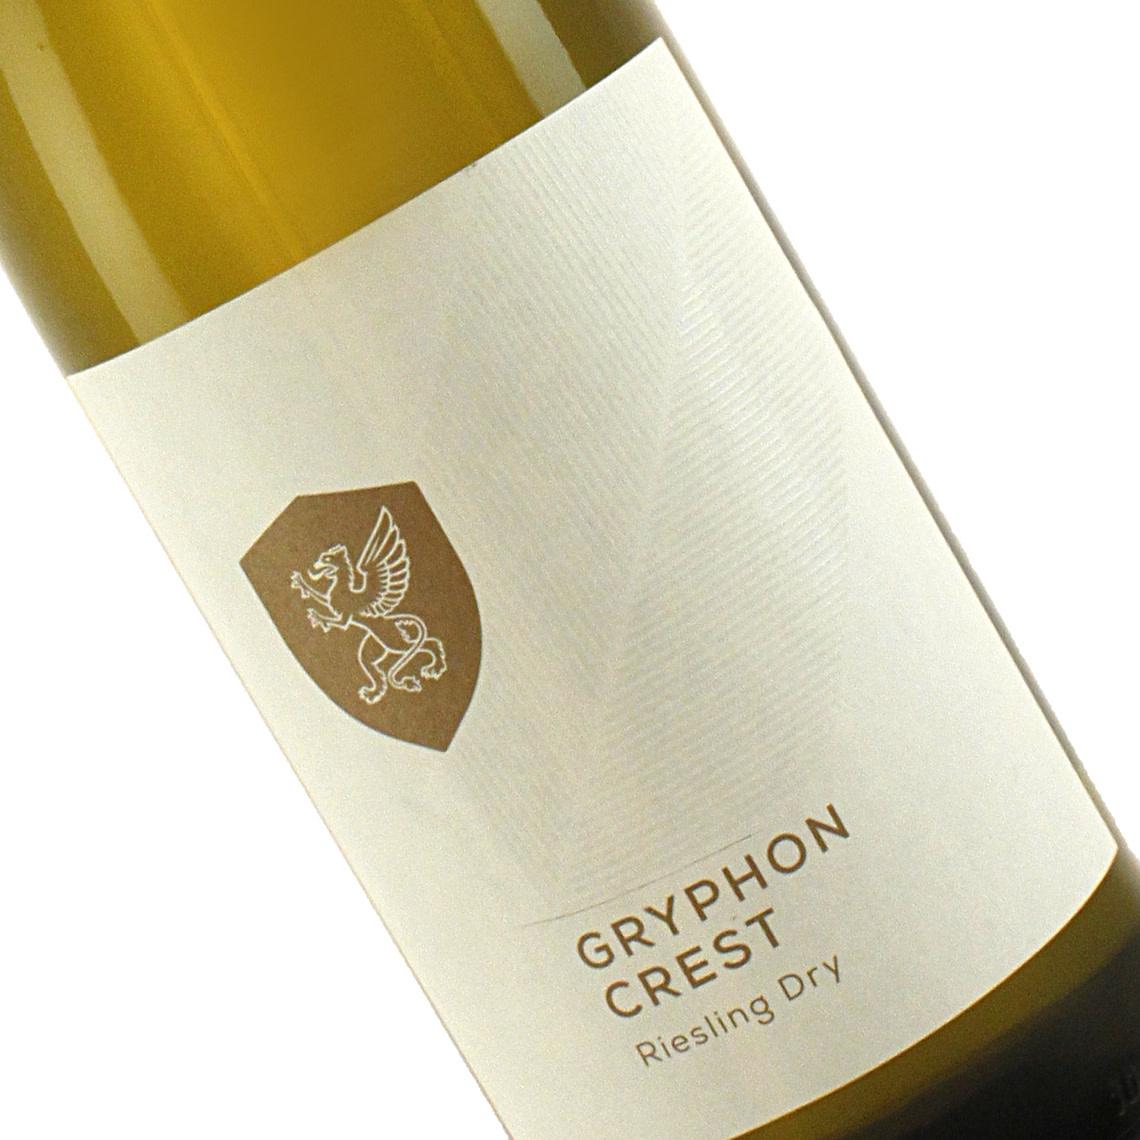 Gryphon Crest 2017 Riesling Dry, Rheinhessen